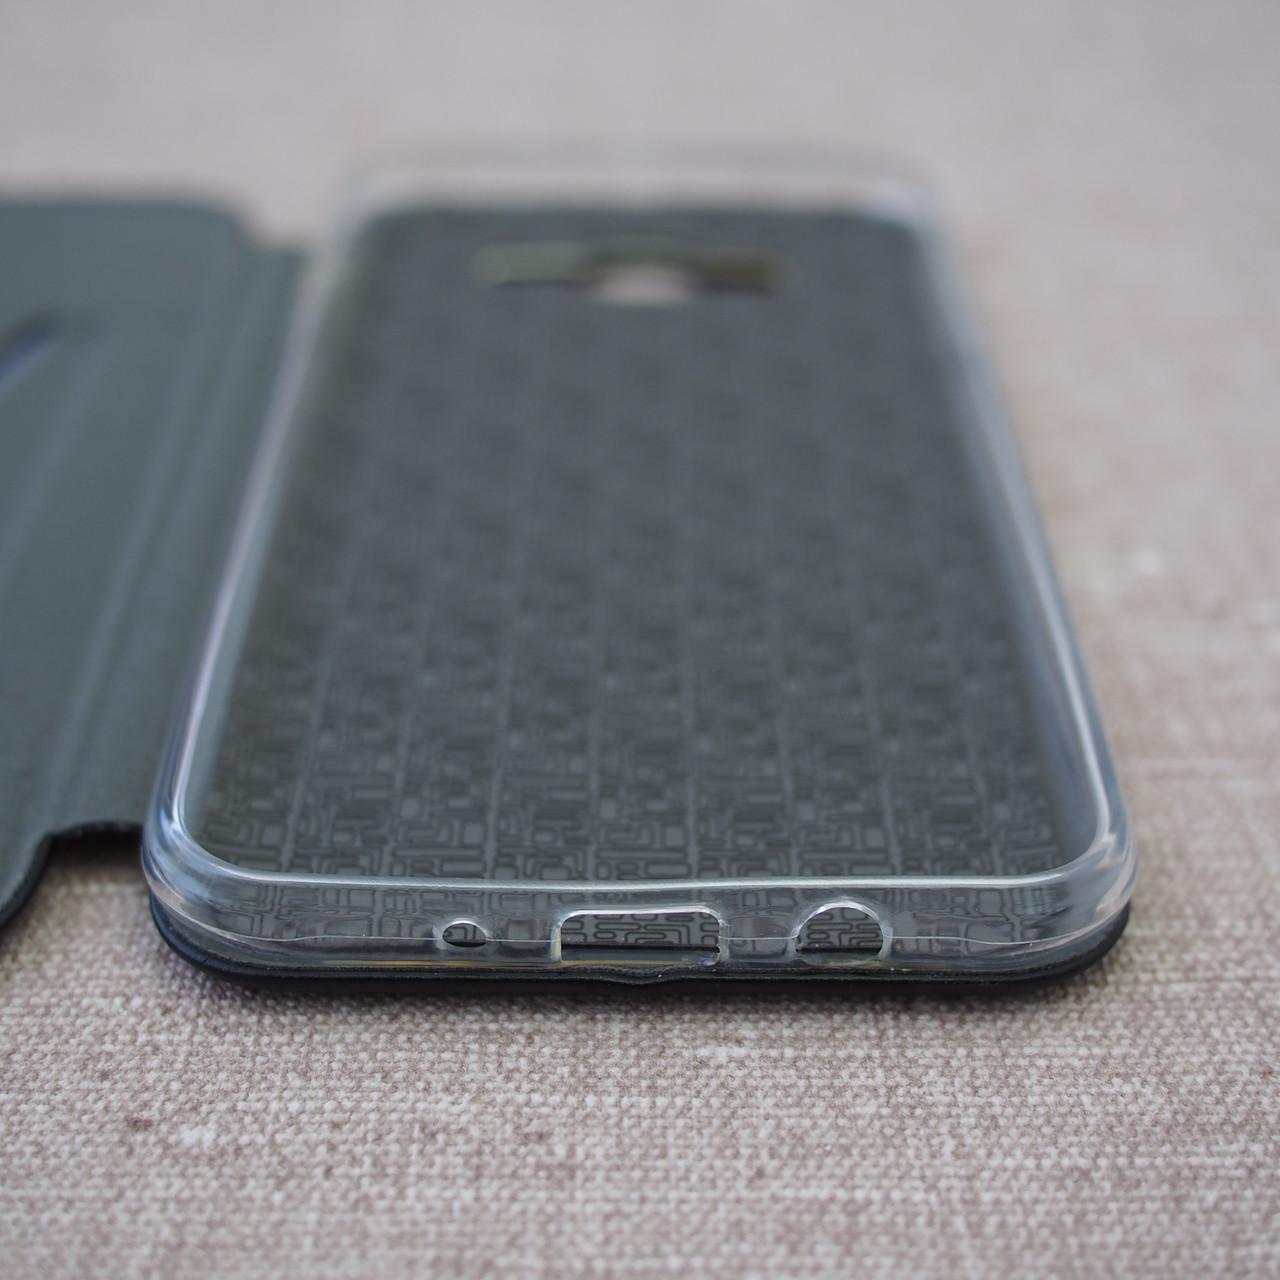 G-Case Samsung J7 J700 black Galaxy (J737) 2018 Для телефона Черный